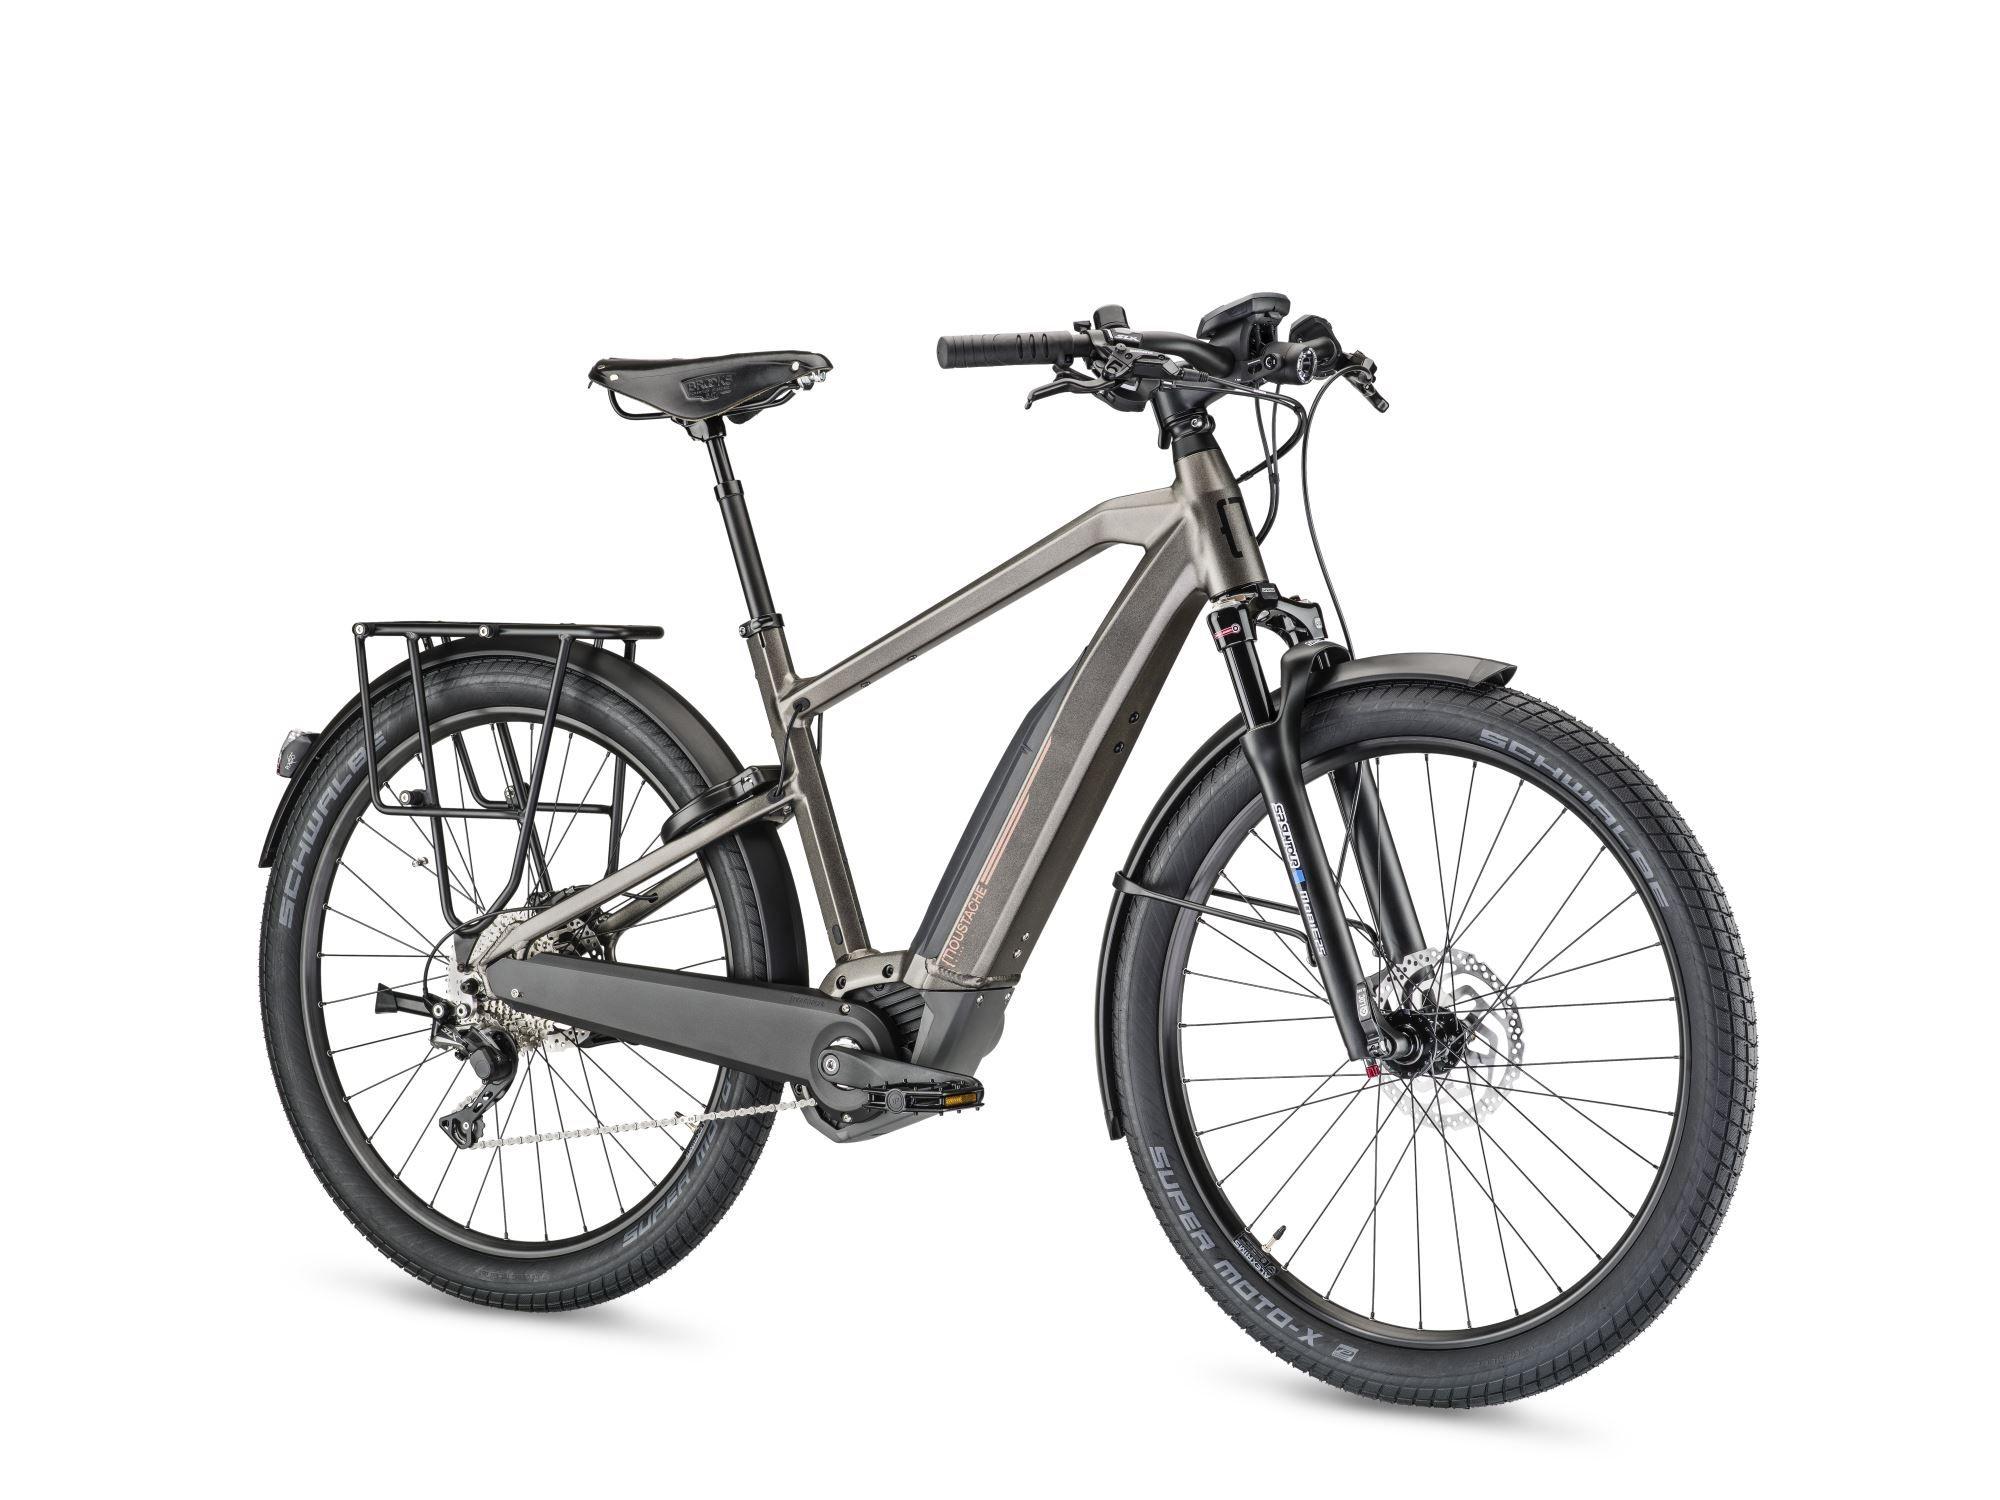 Http Www Moustachebikes Com De Friday 27 5 Html Pedelec Elektrofahrrad Fahrrad